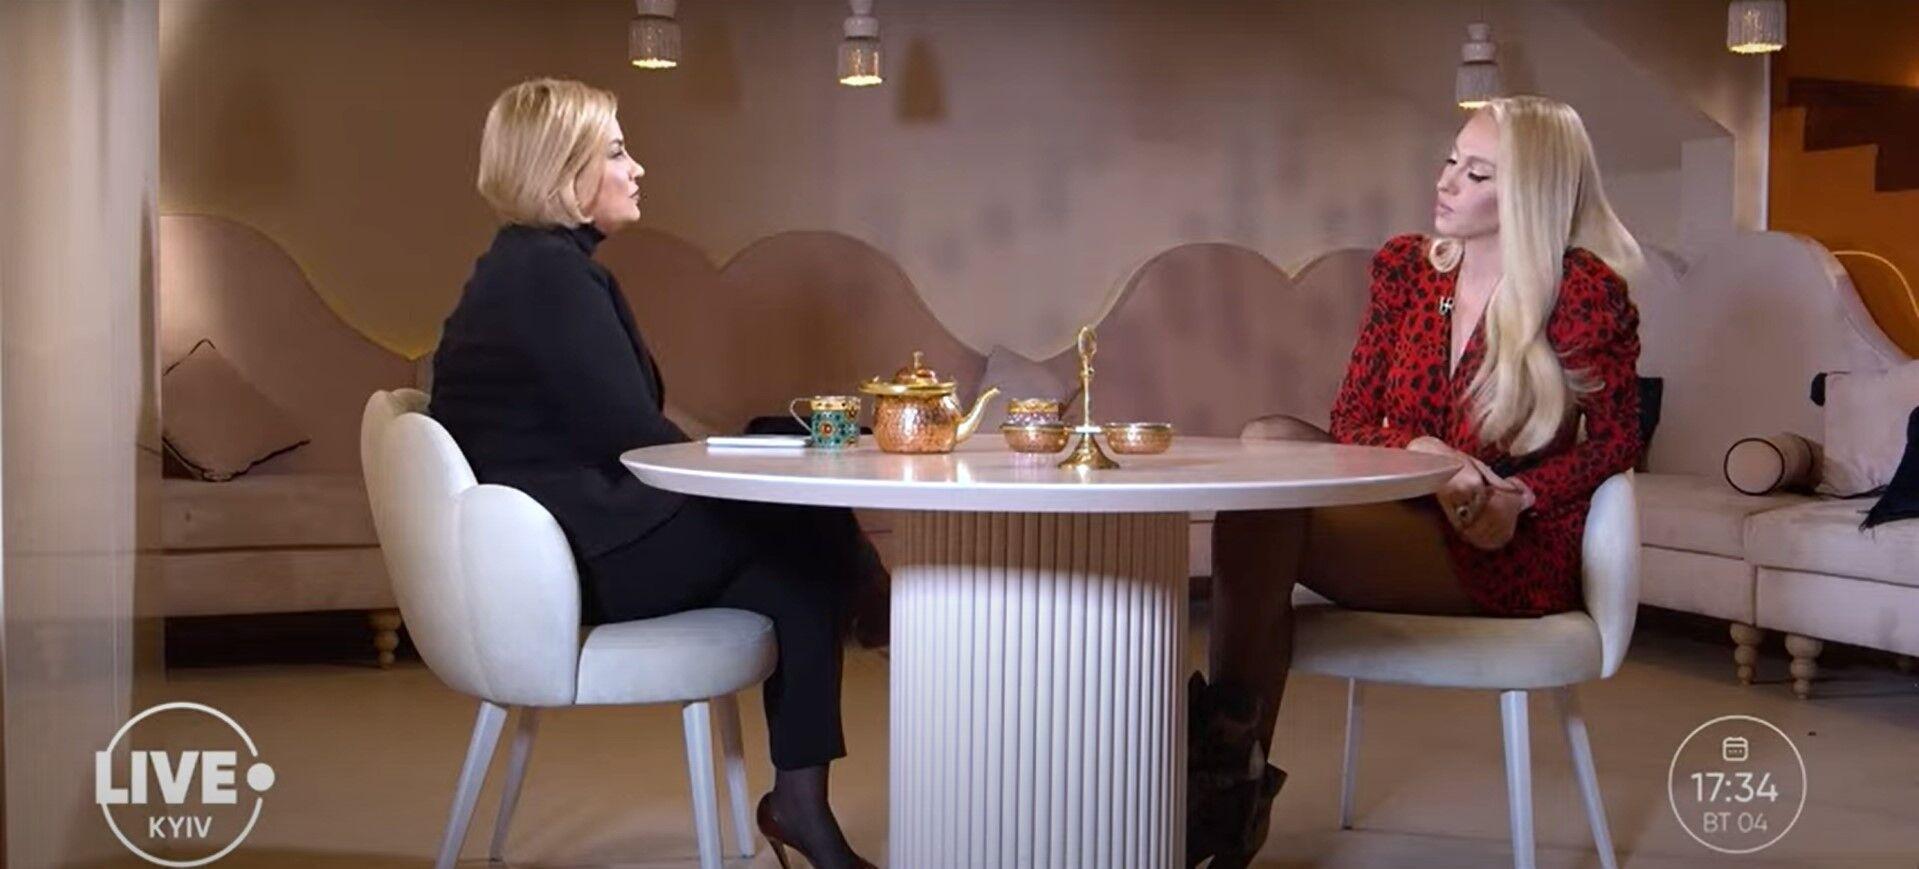 Полякова дала інтерв'ю.